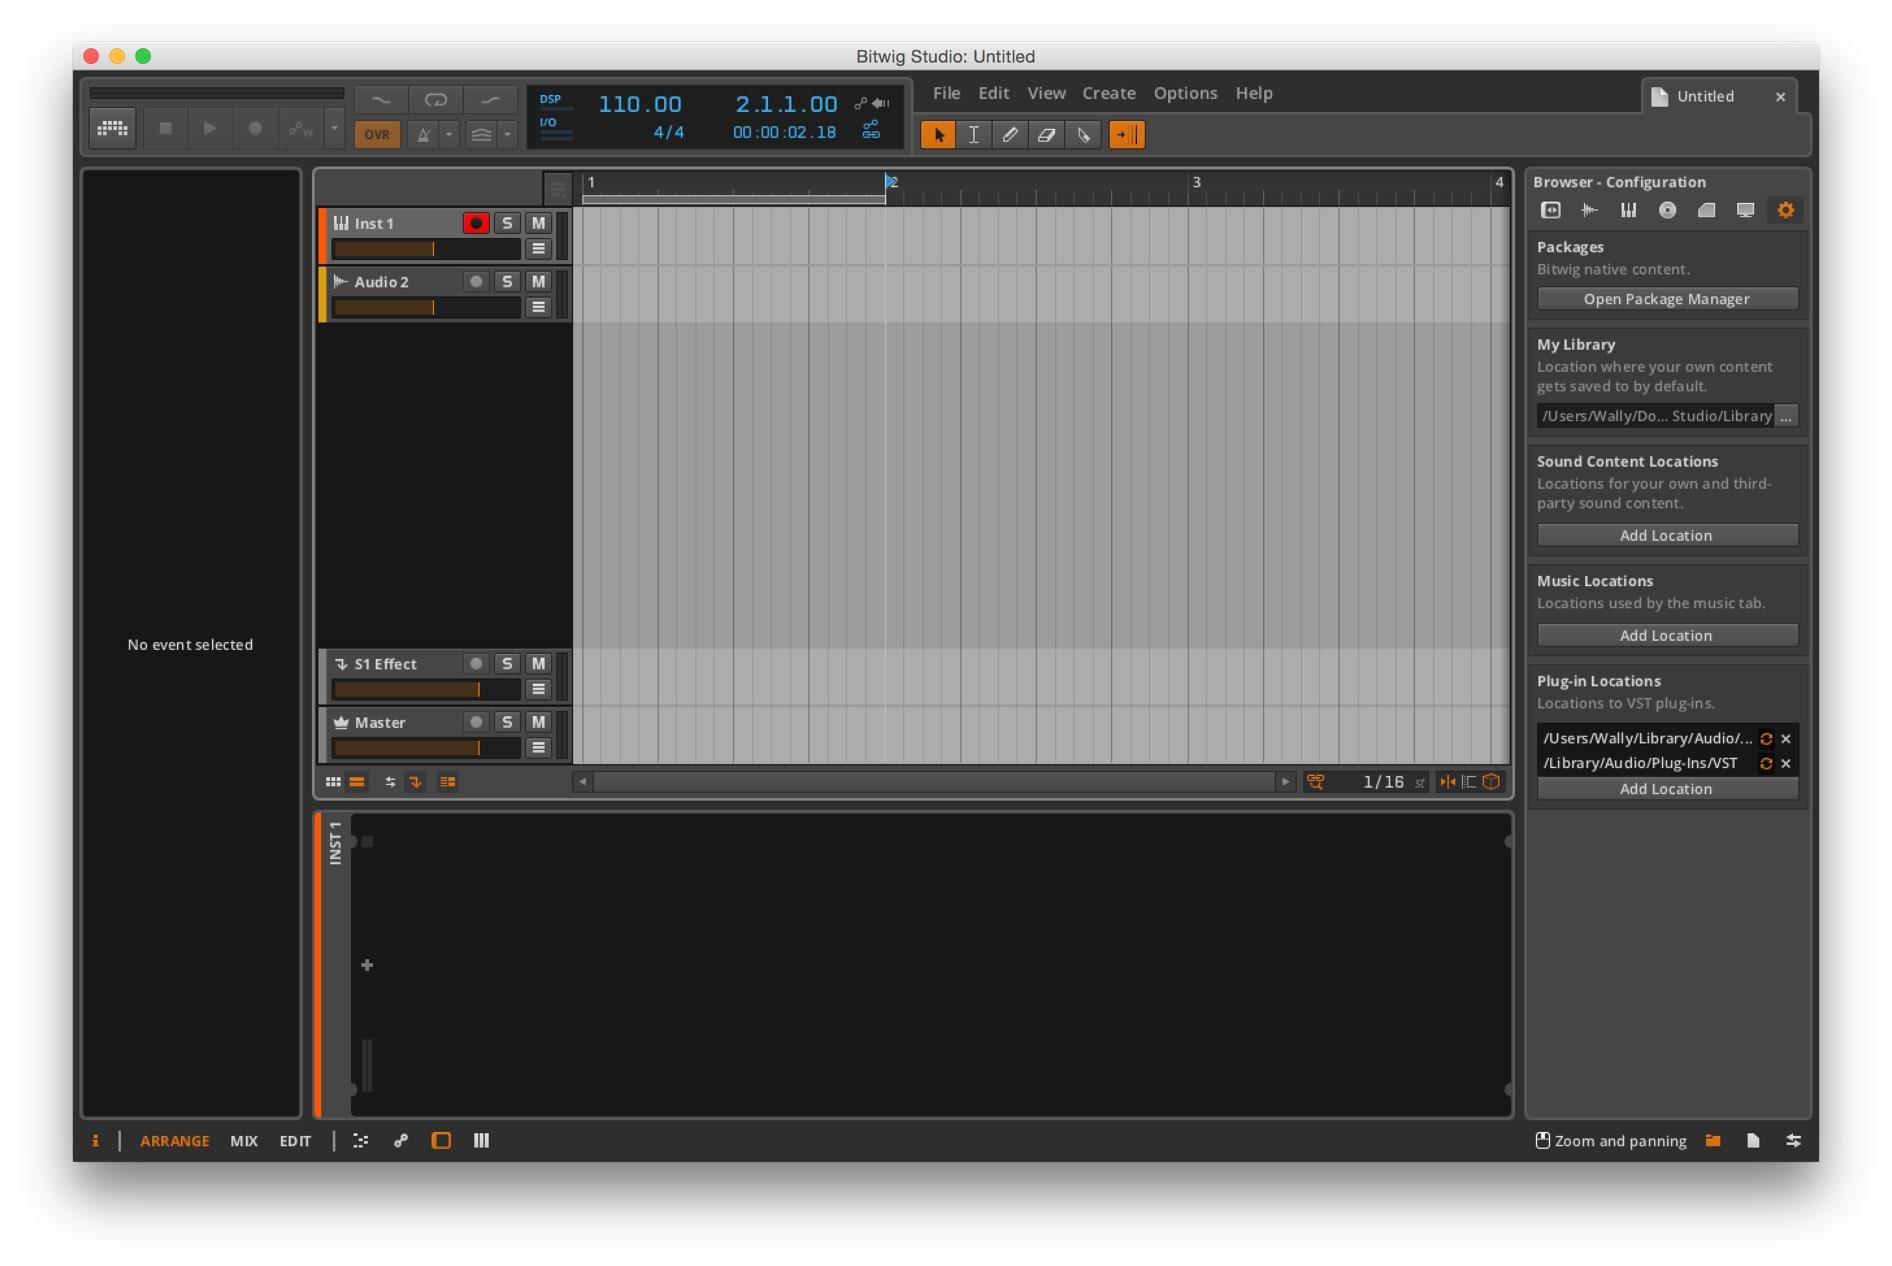 Mac软件-Bitwig Studio:专业音频编辑软件 for Mac 1.0.11 下载